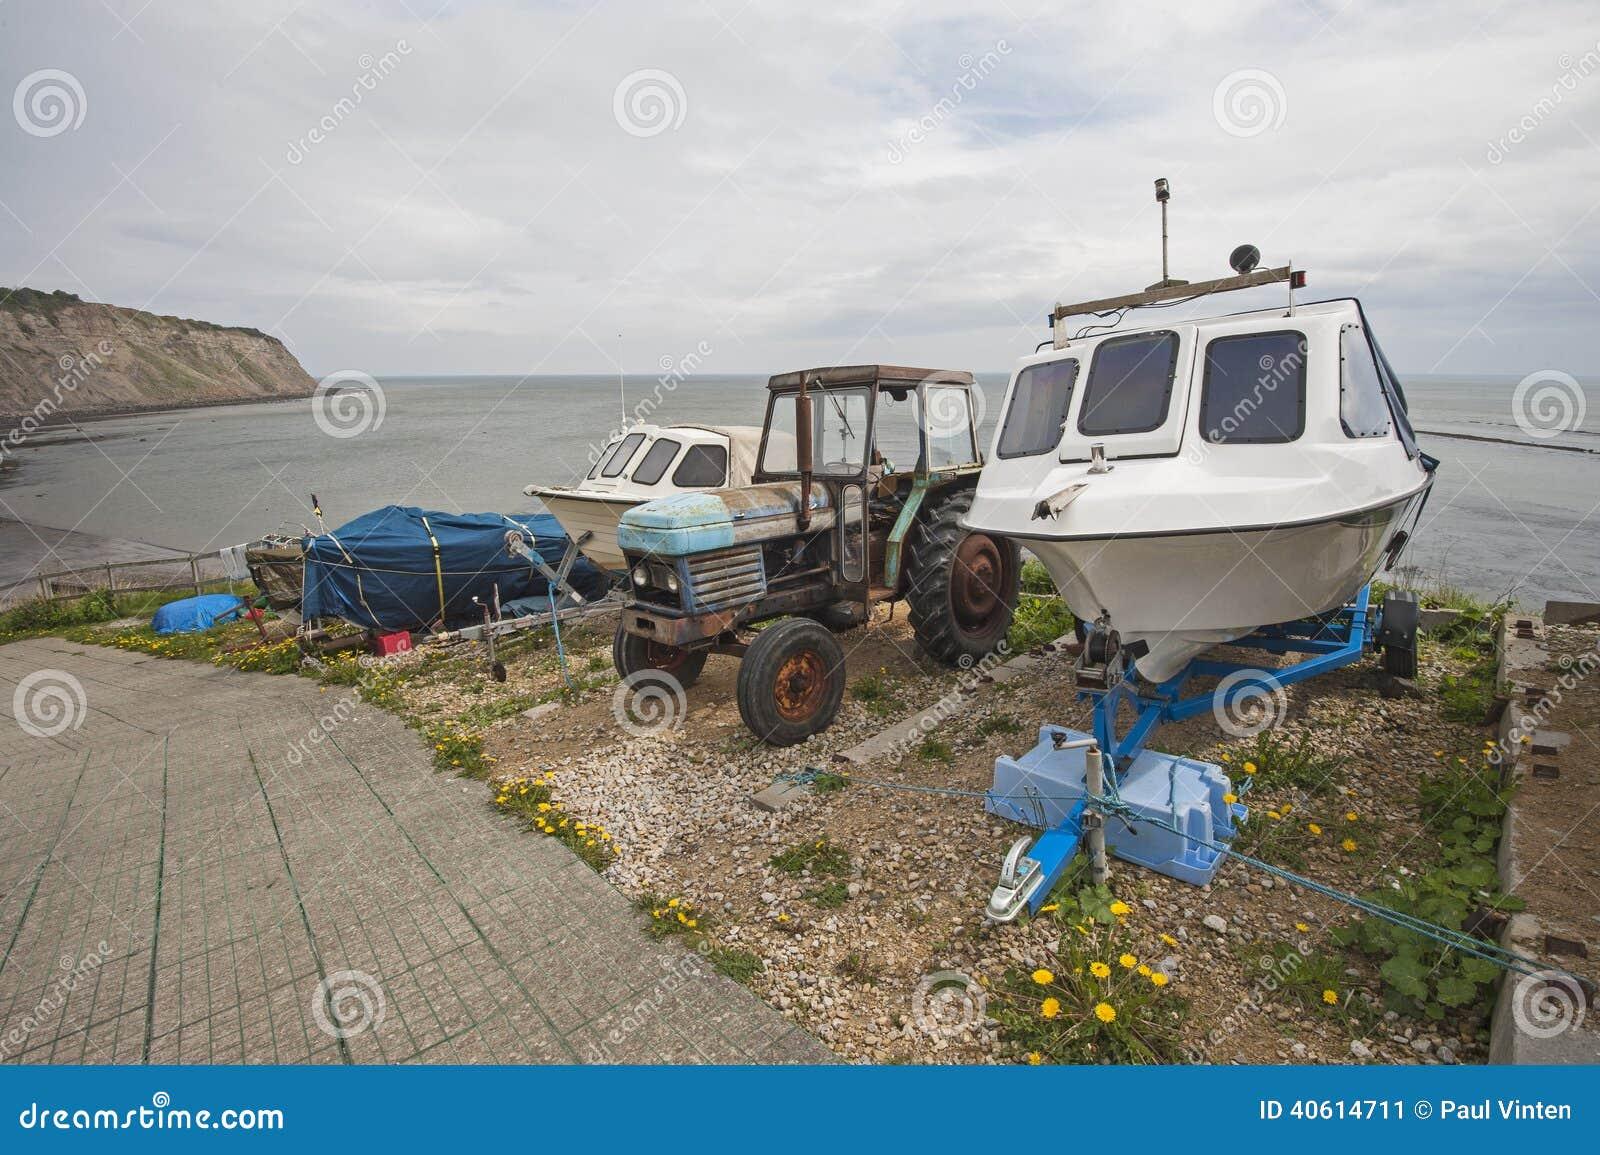 Small pleasure boat on slipway at coast